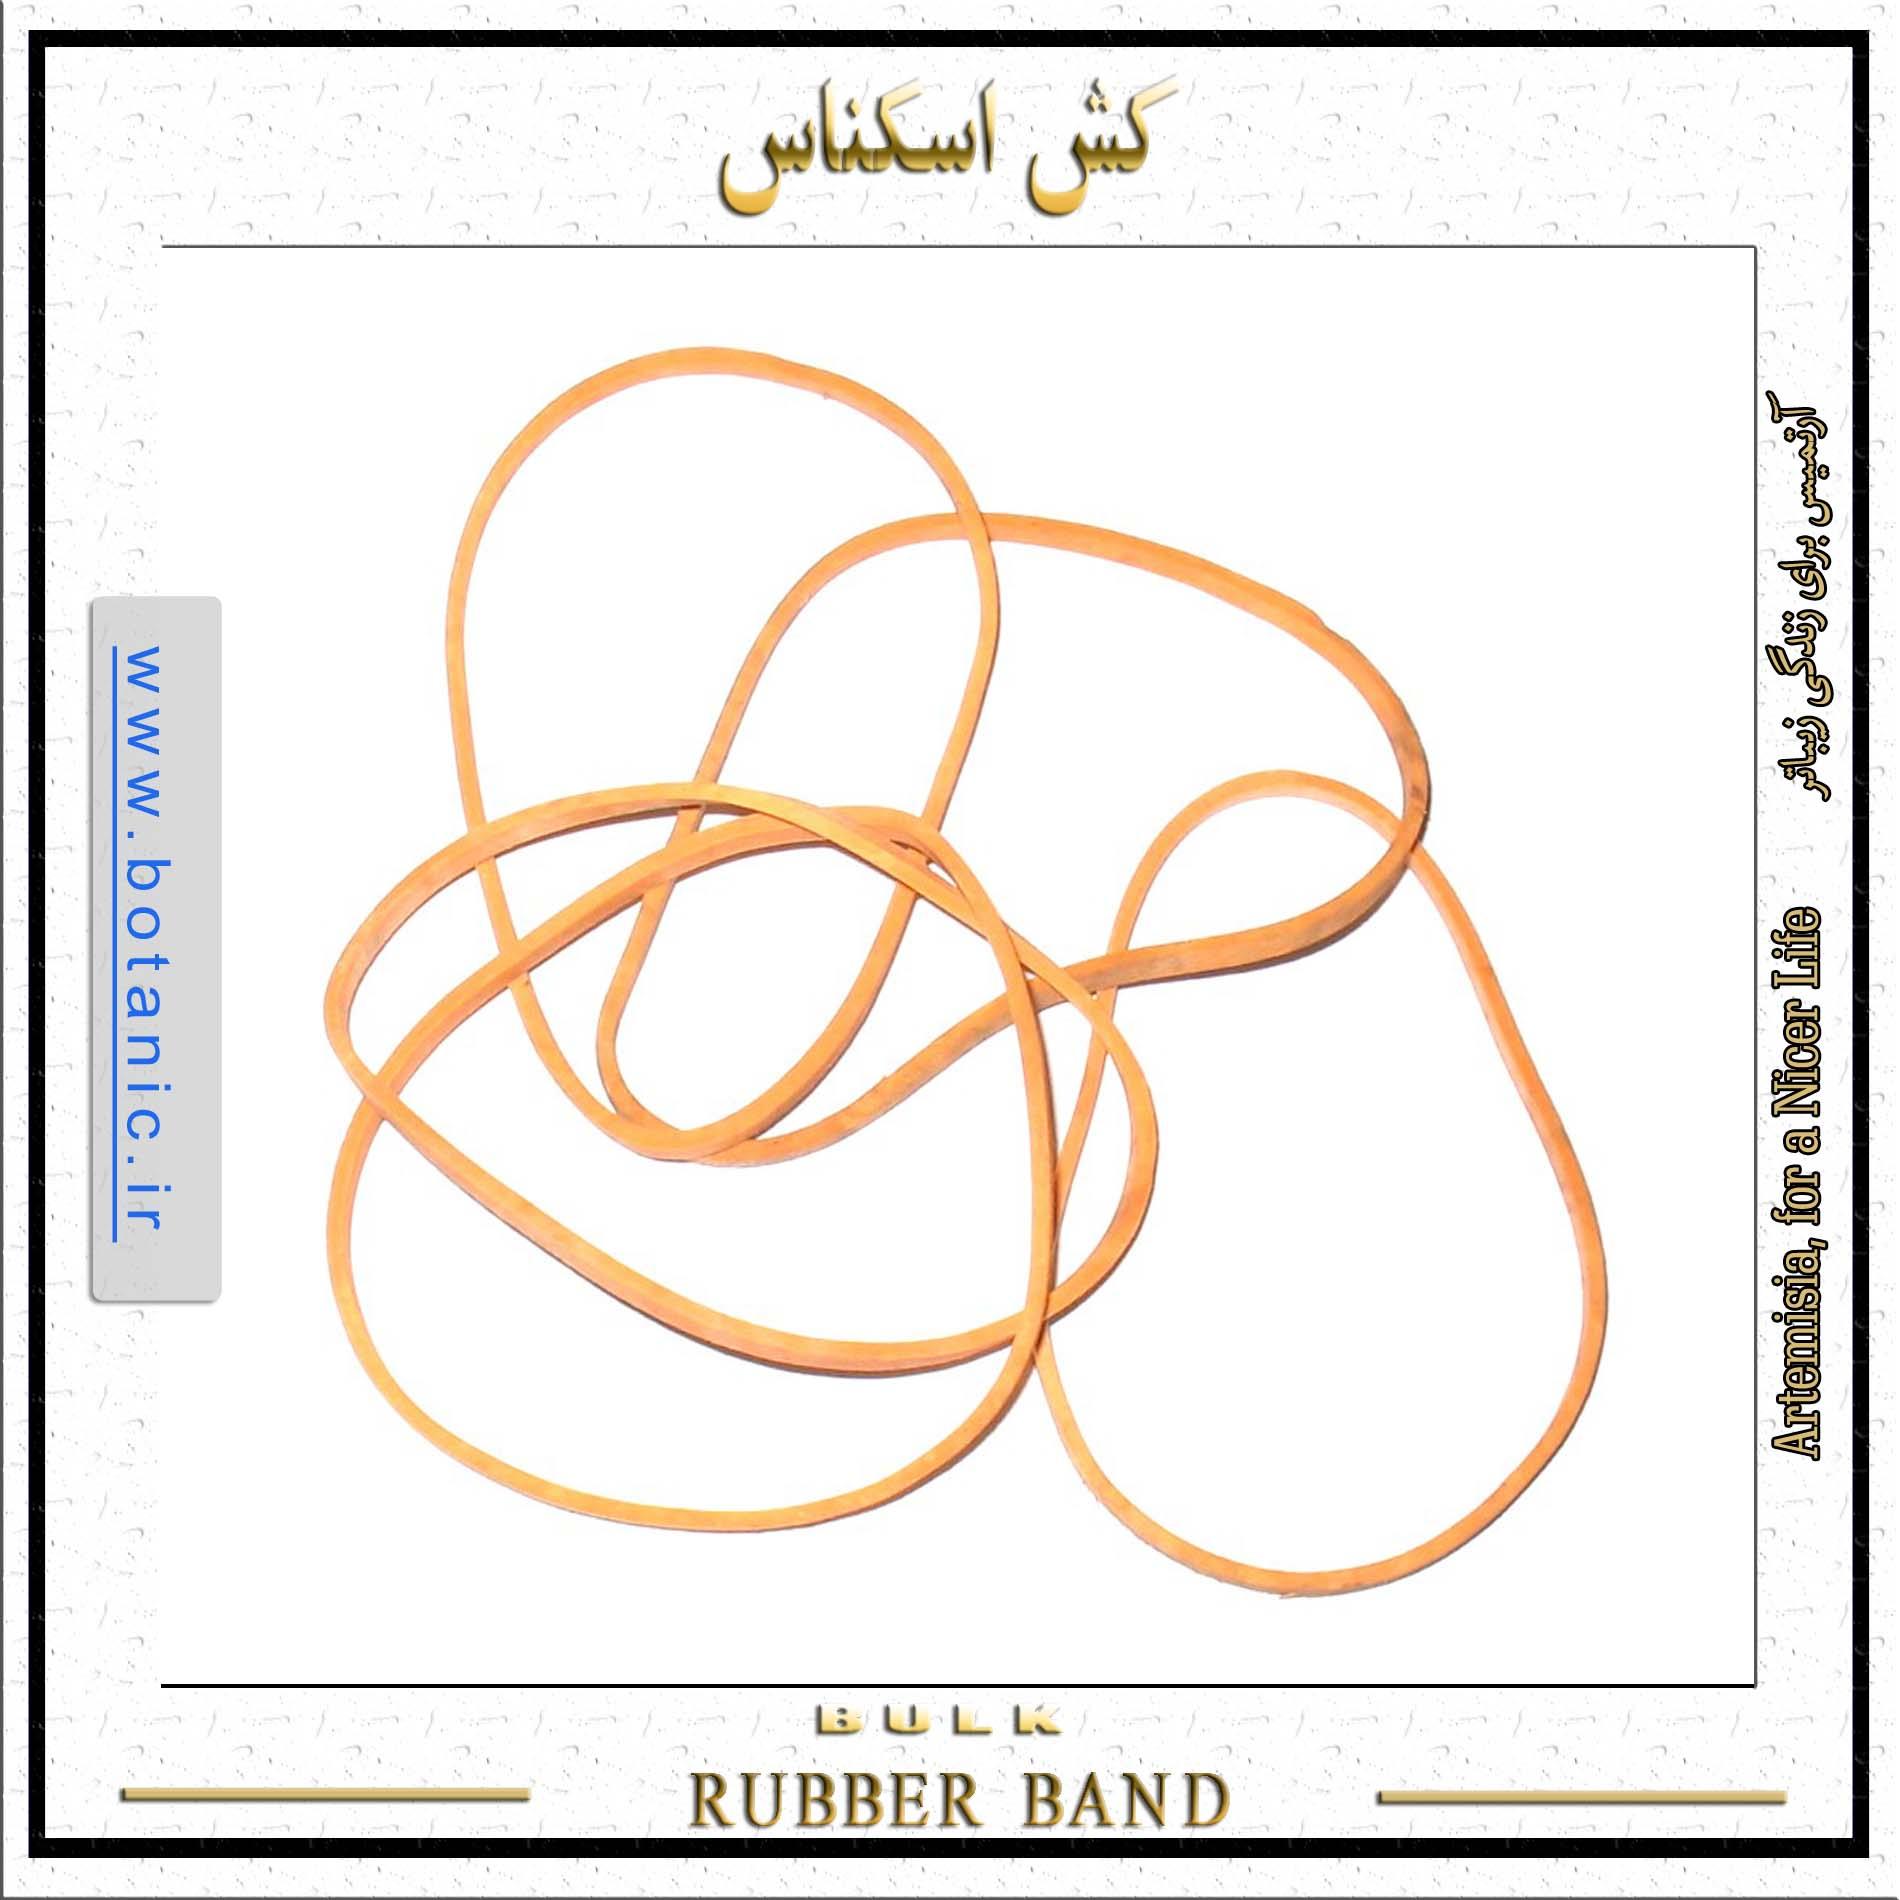 Bulk Rubber Band